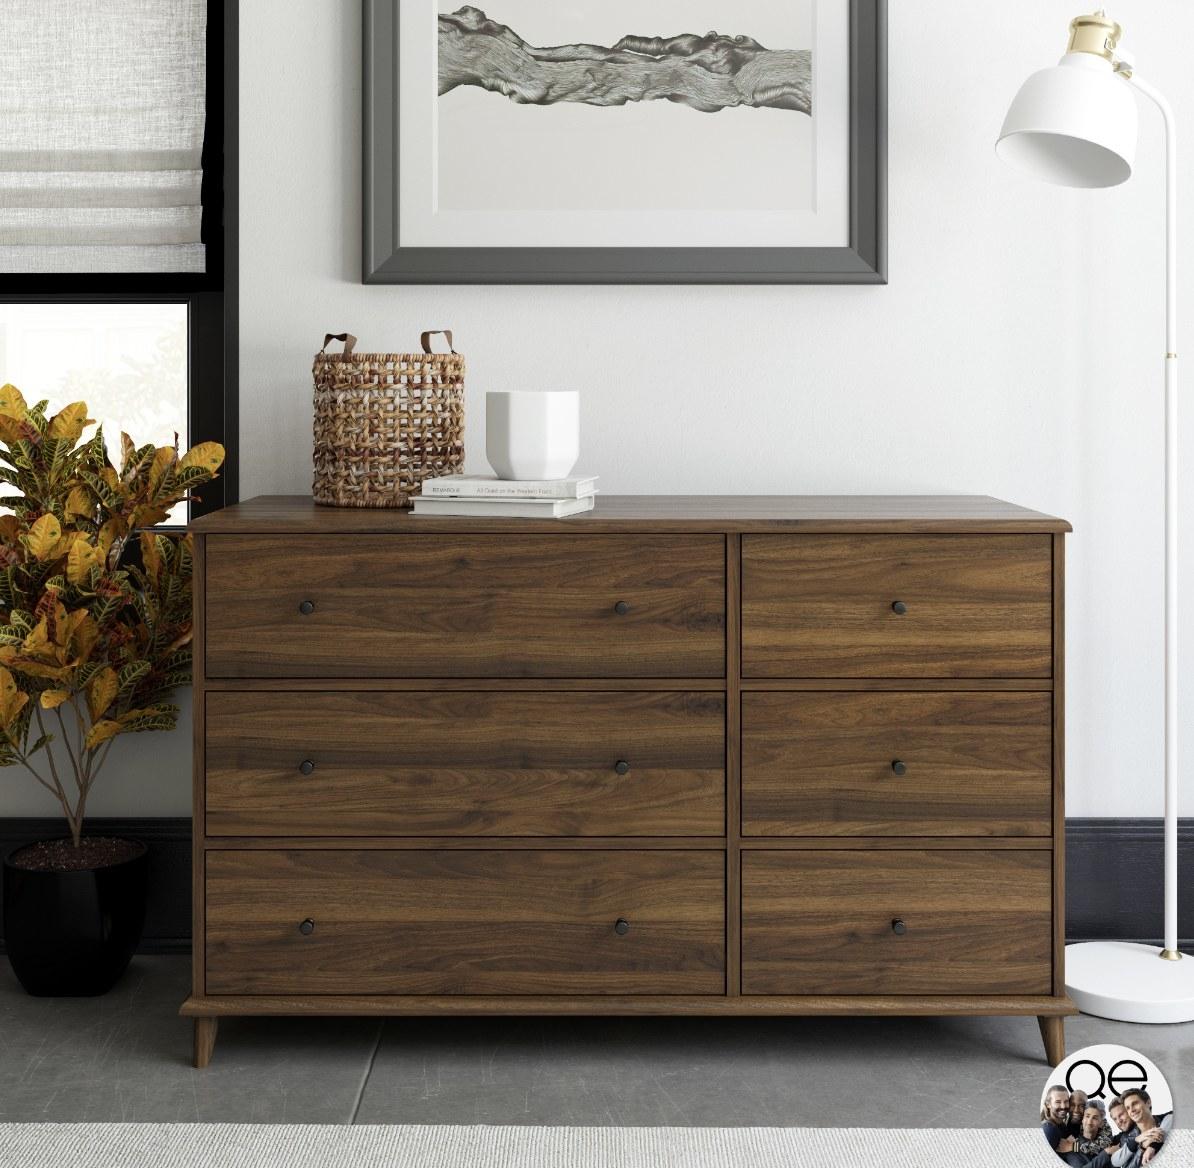 the walnut six-drawer dresser